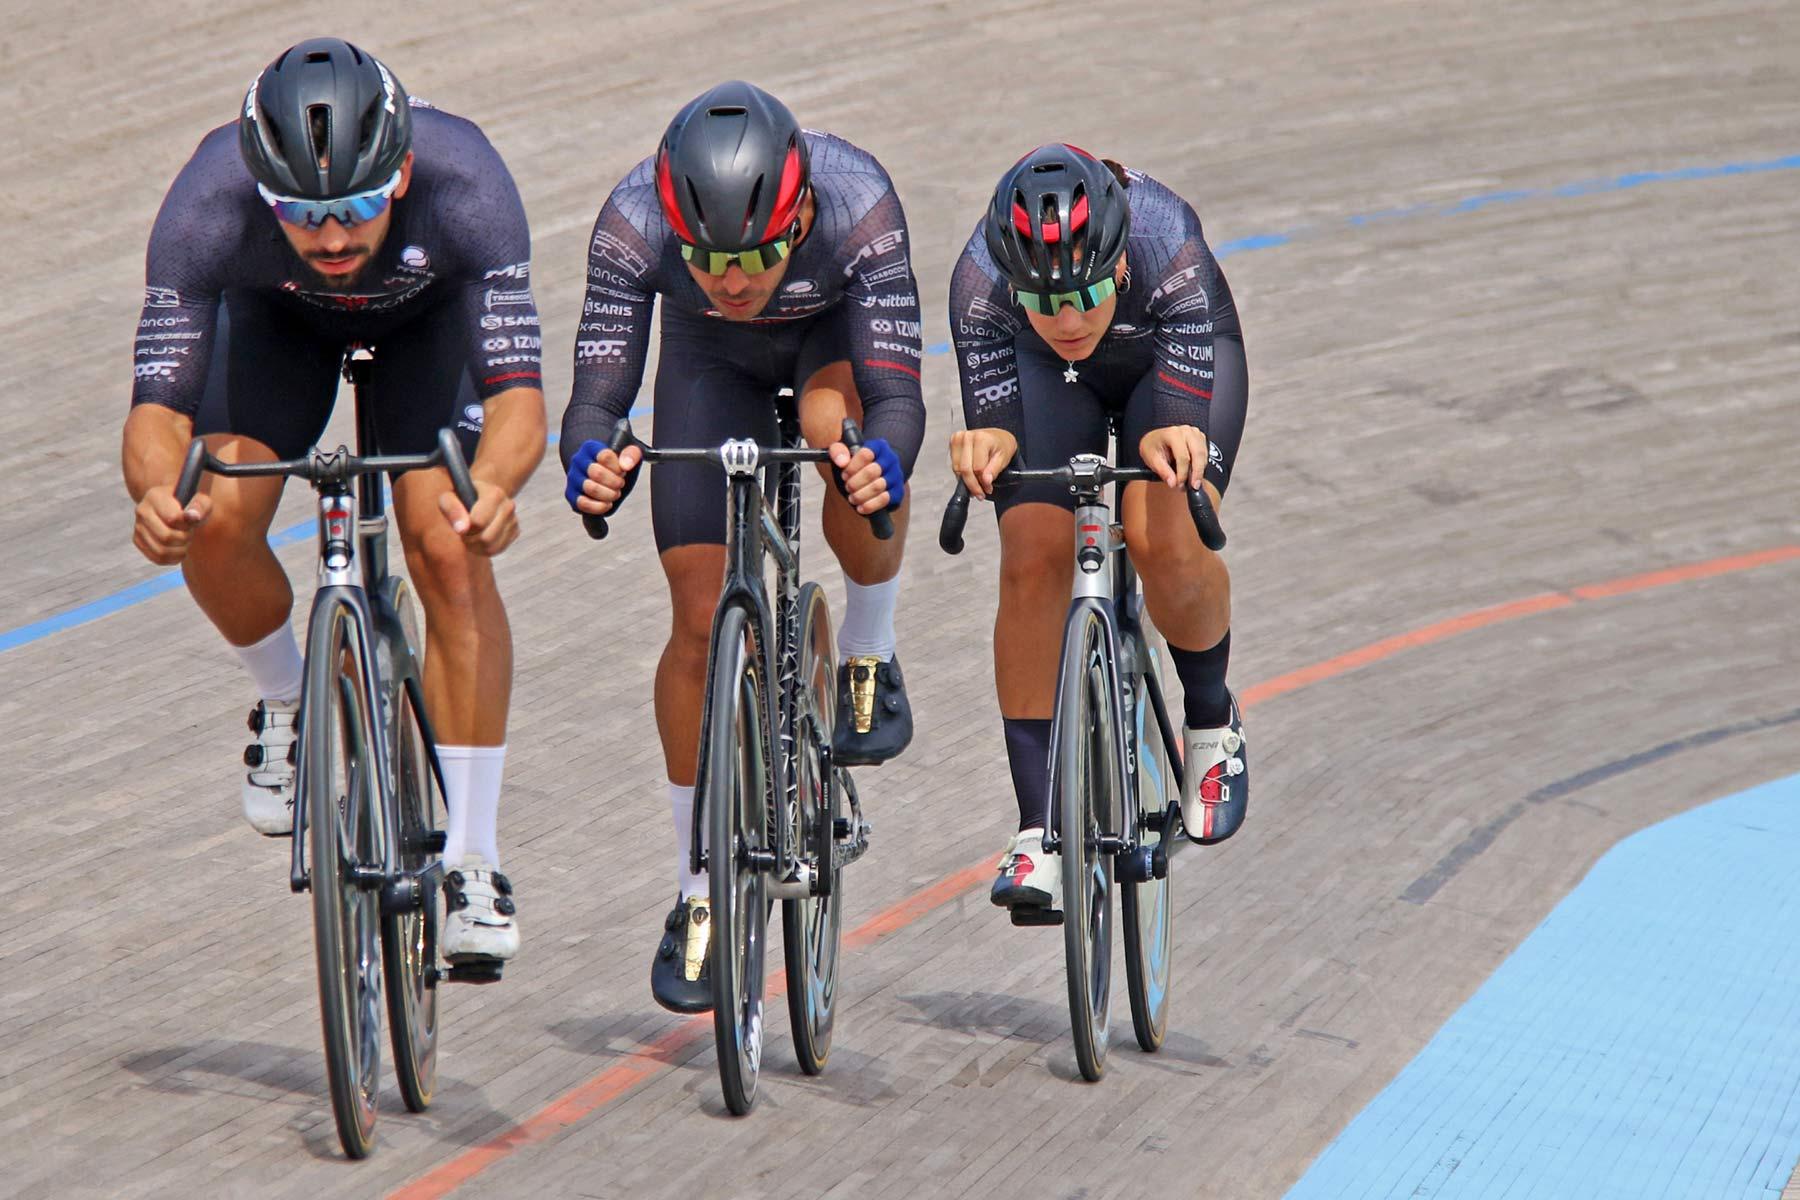 TRed TOOT ASHAA ergonomic carbon track handlebar,Barcelona velodrome testing